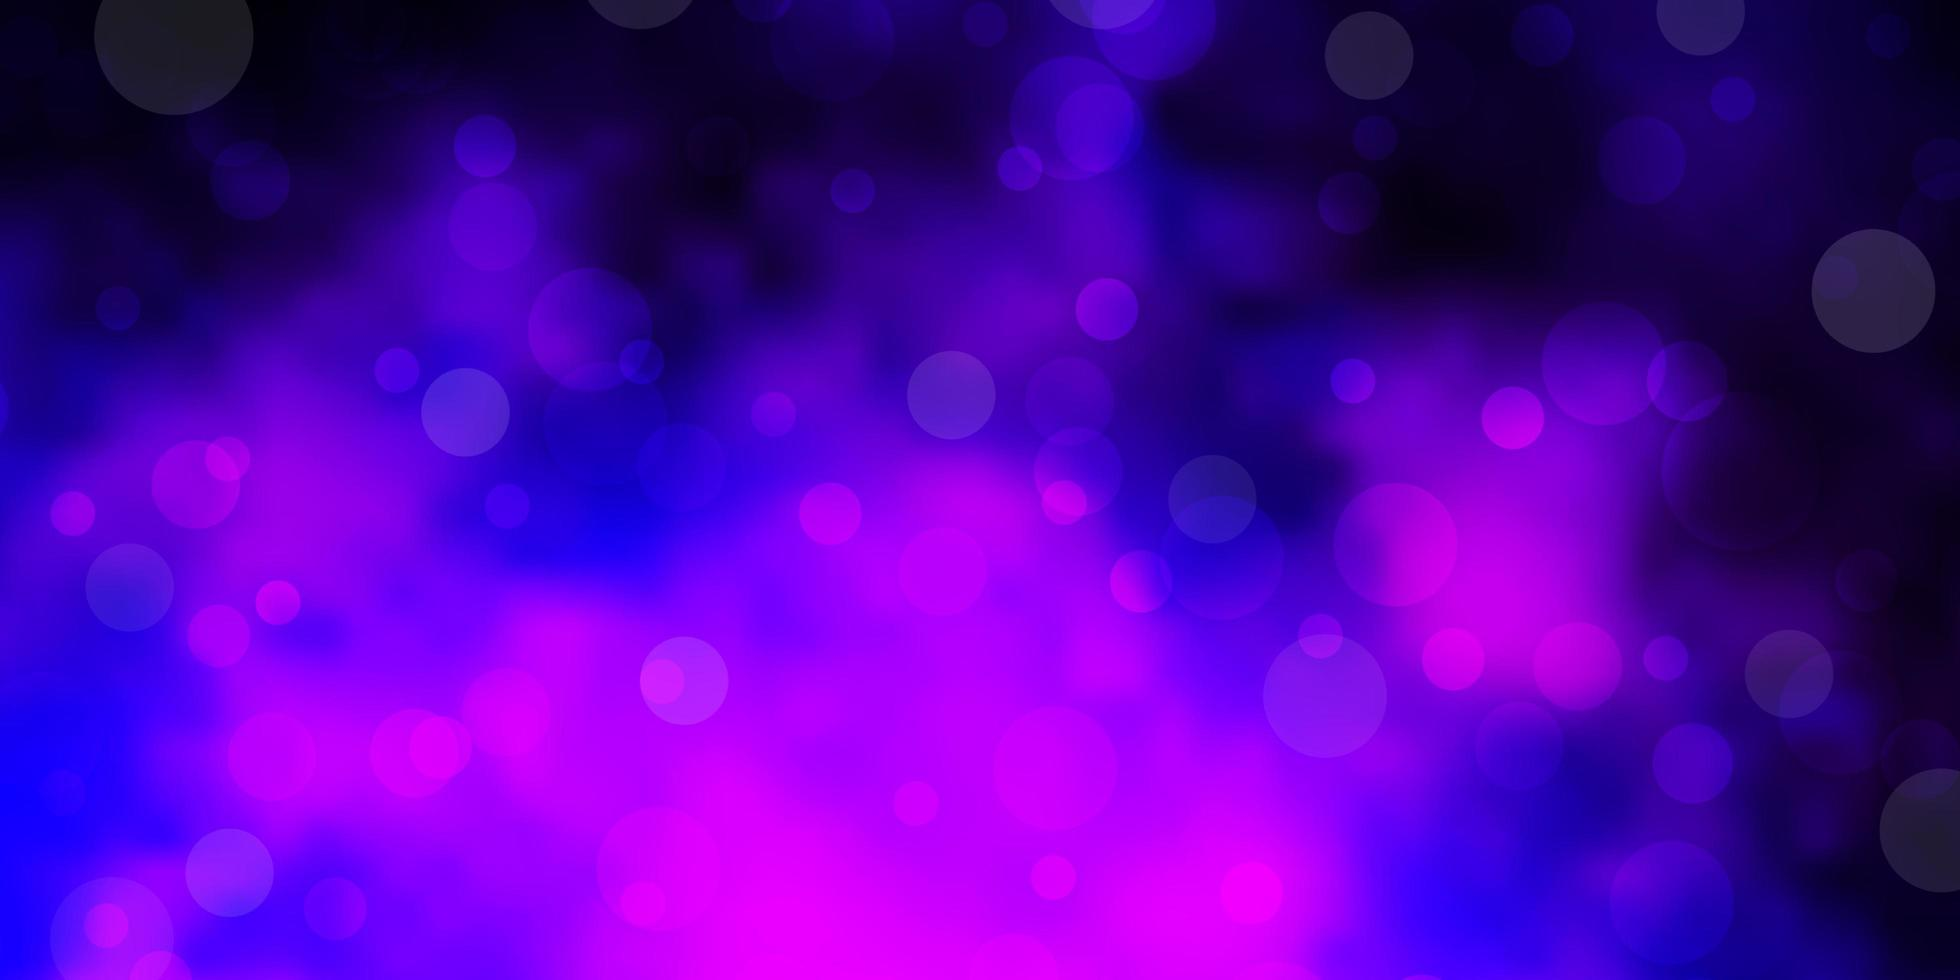 dunkelviolette Vektorschablone mit Kreisen. vektor